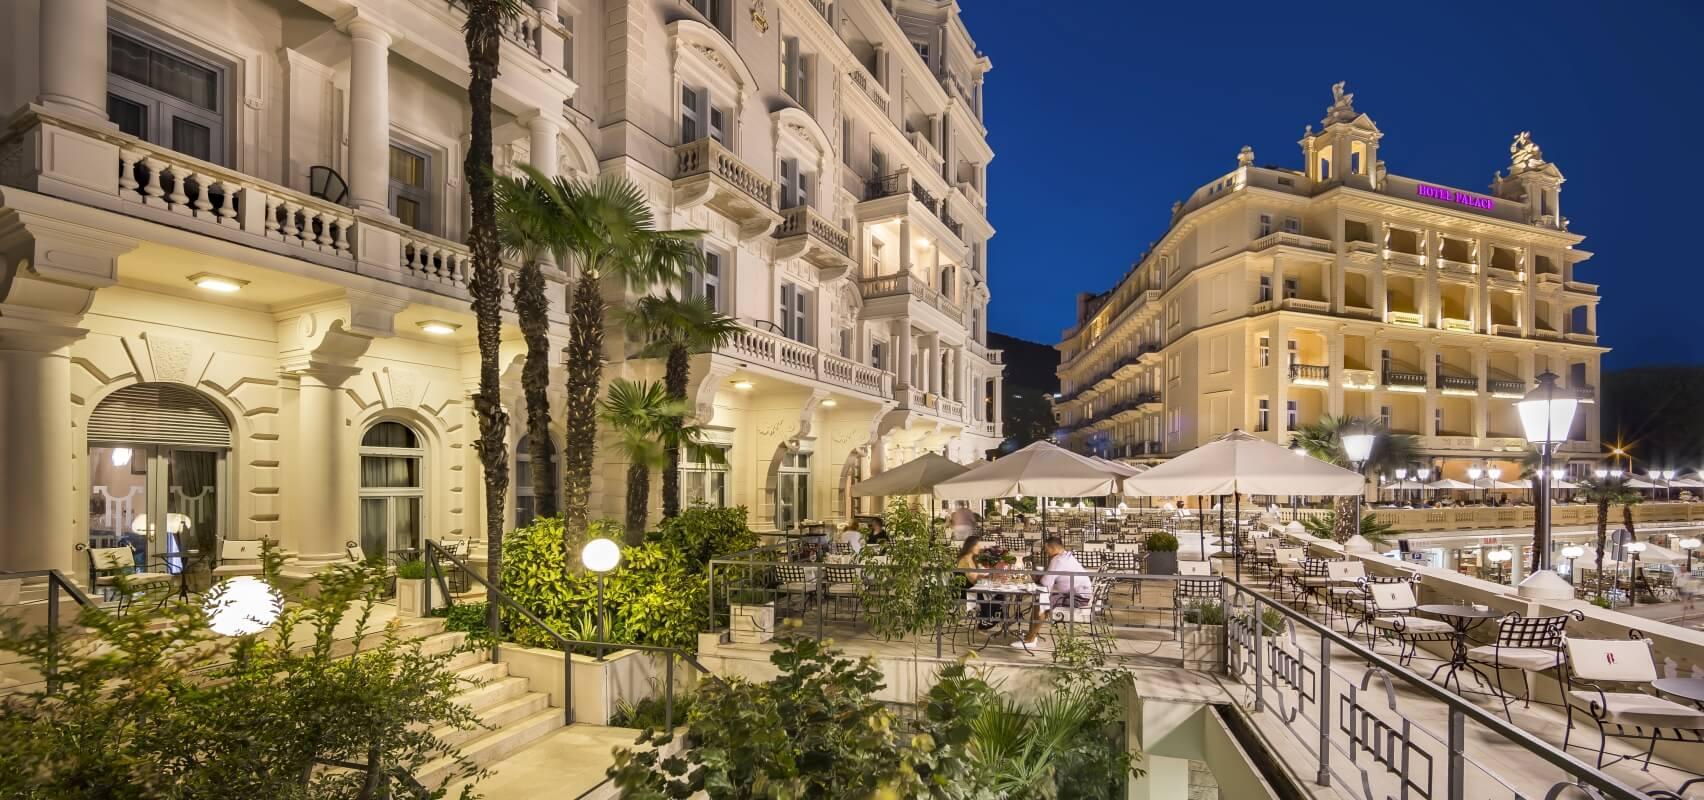 Hotel Palace Bellevue Opatija Croatia  U2013 Remisens Hotels